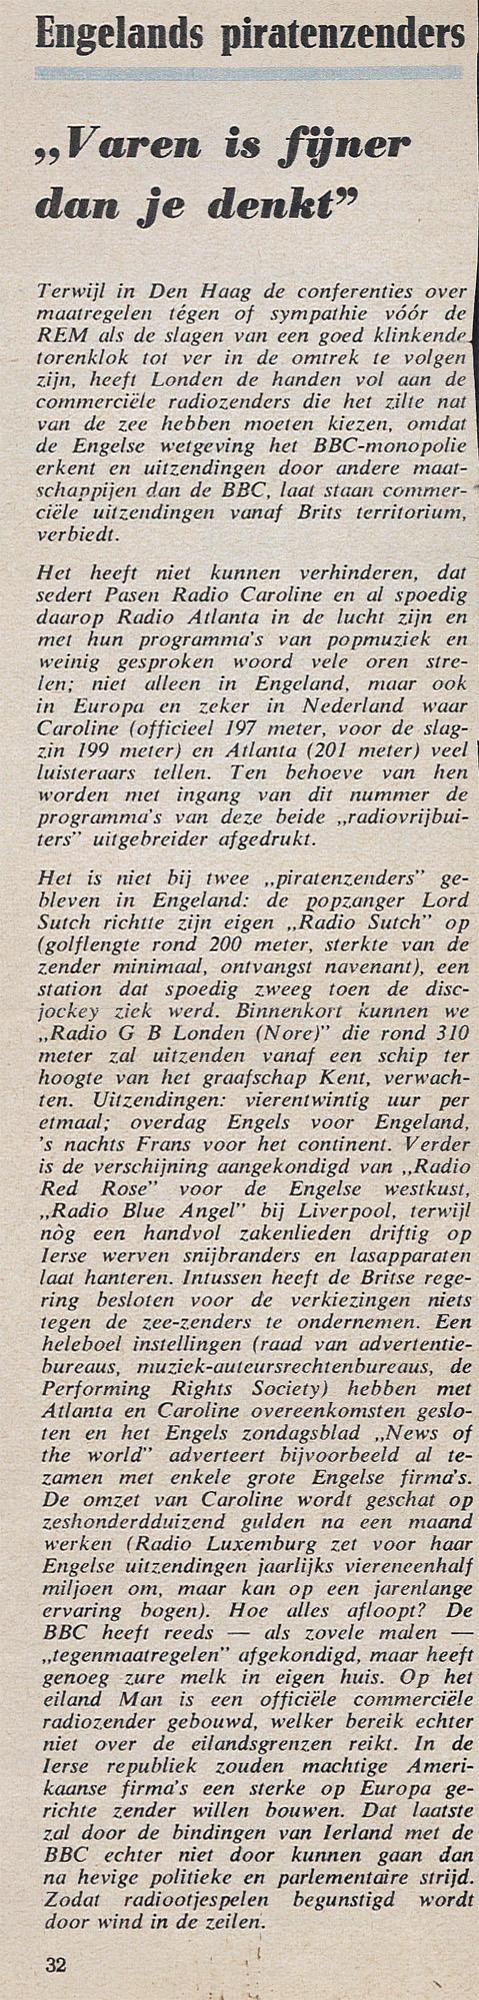 196410_Televizier Engelse piratenzenders.jpg